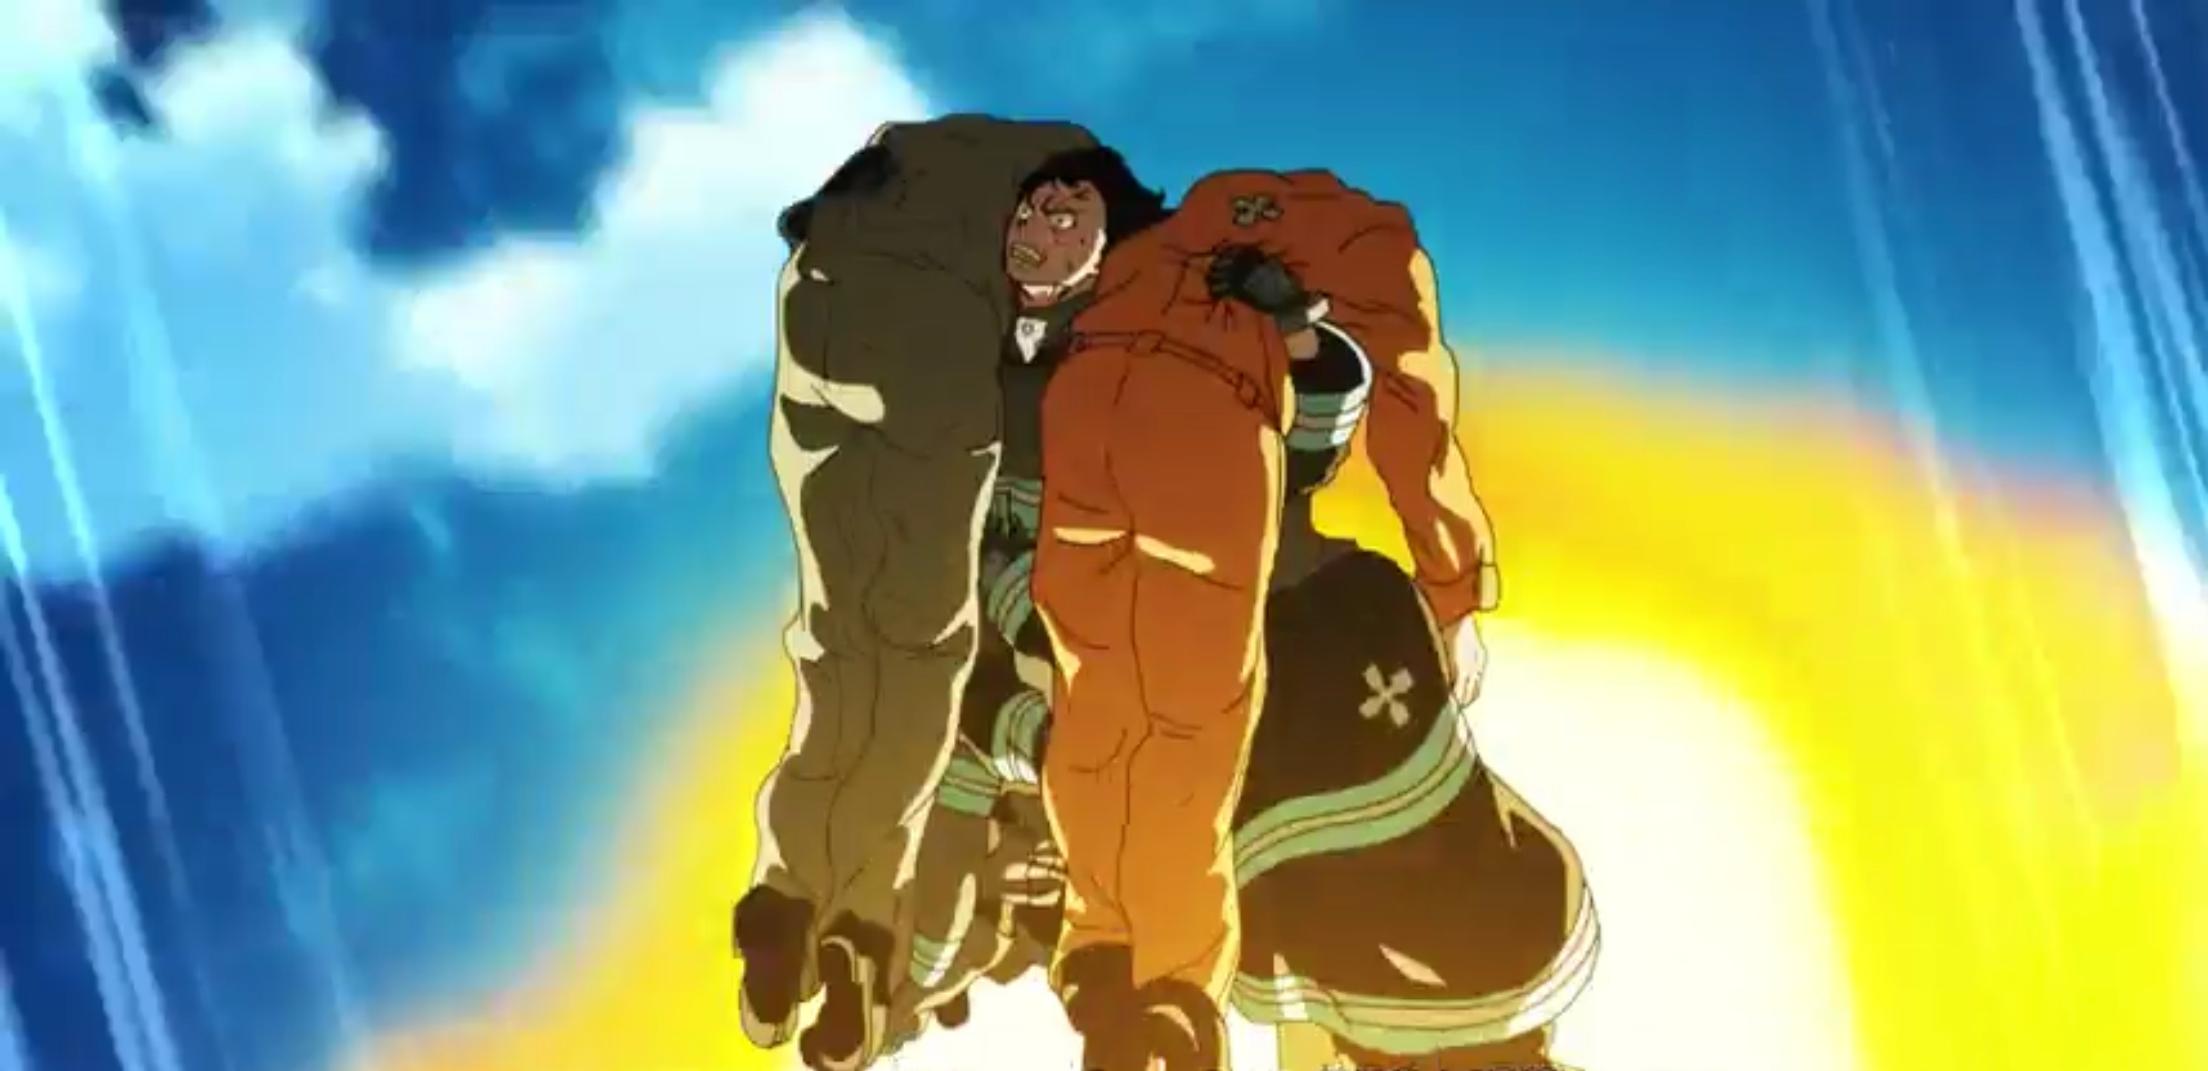 Shinra, fire force